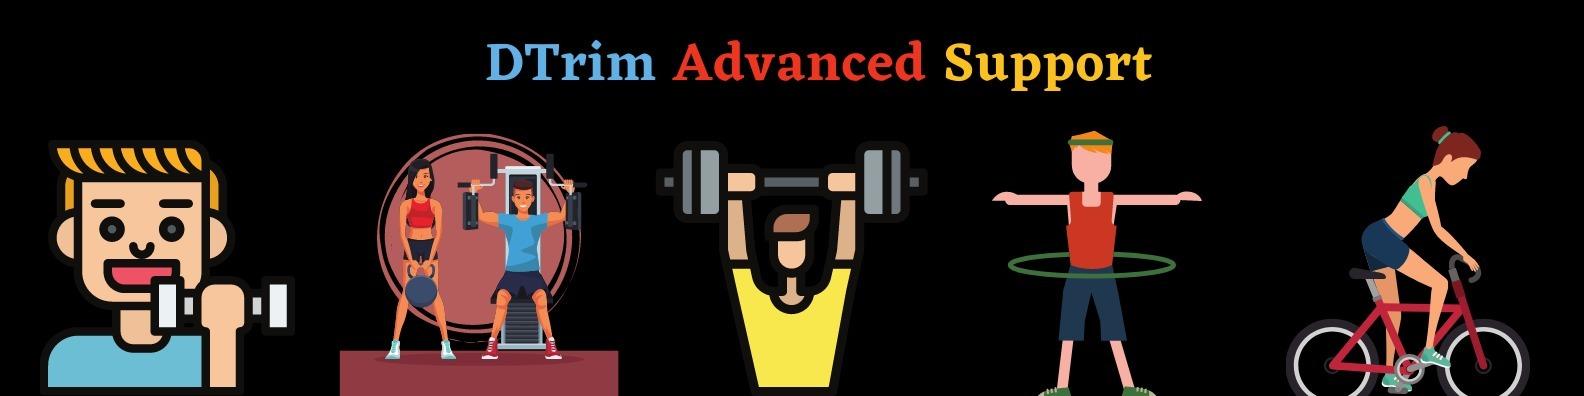 Dtrim Advanced Support (@dtrimadvancedsupportca) Cover Image